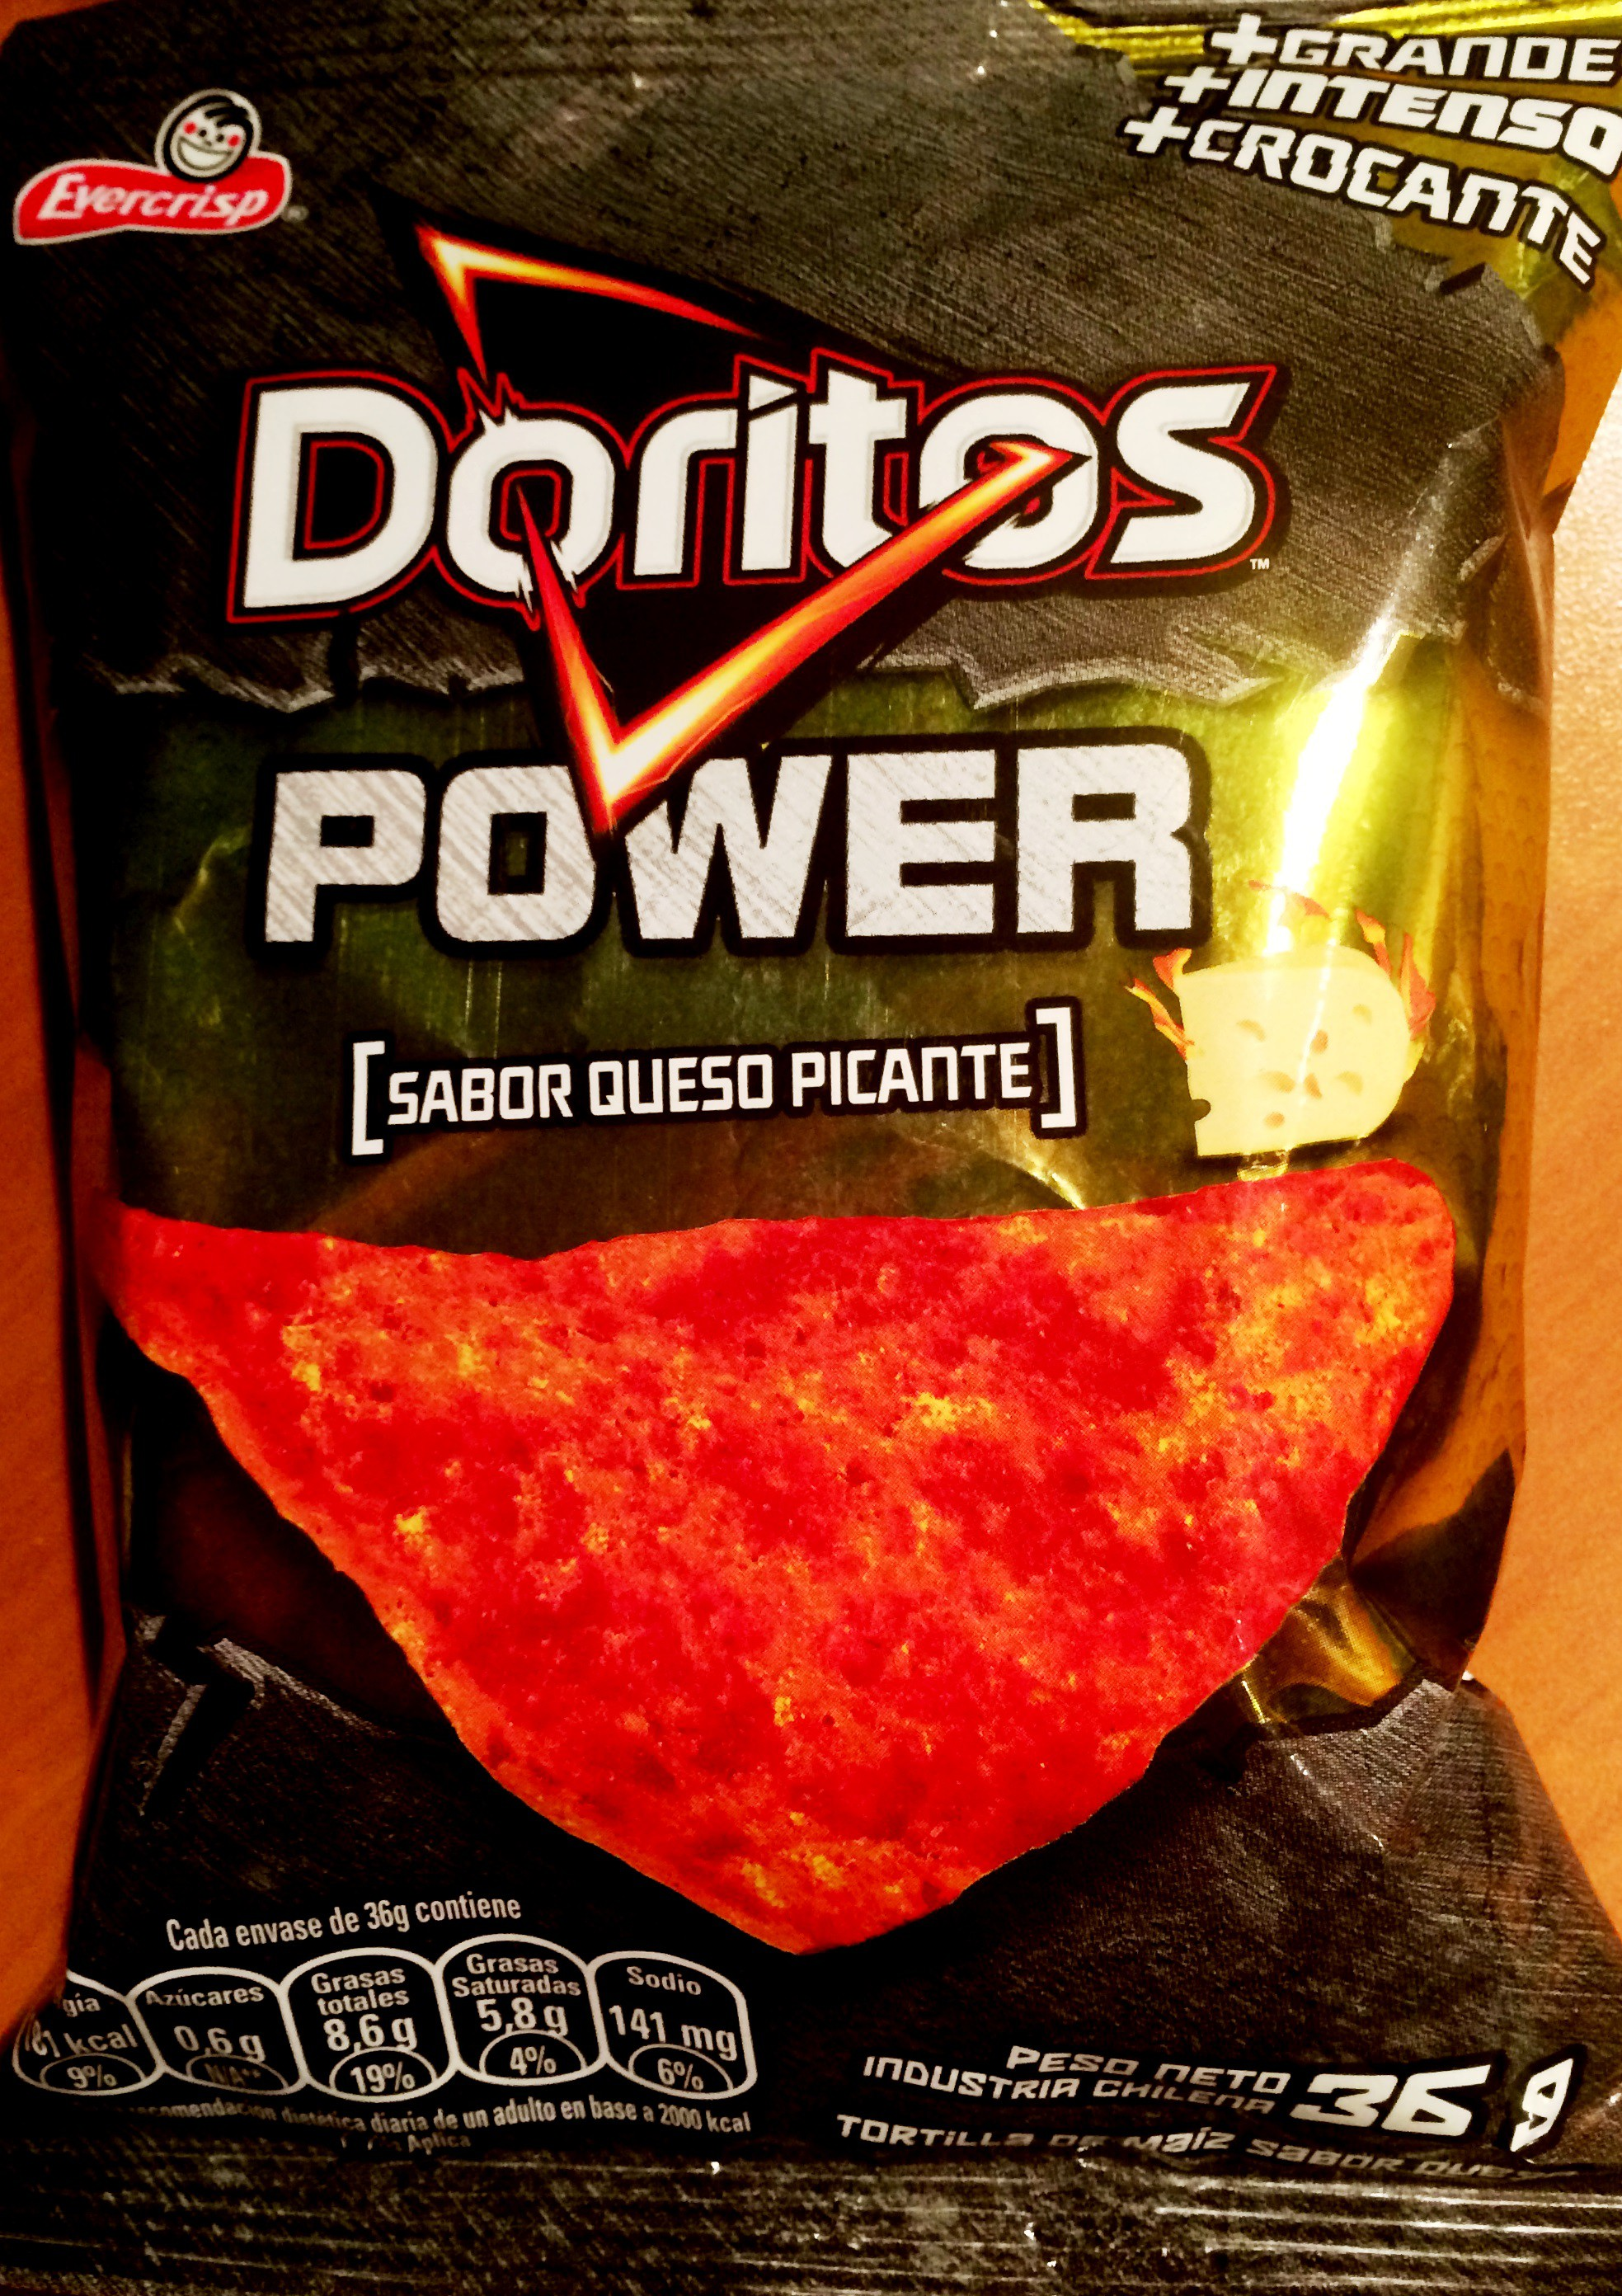 Doritos Power – Queso Picante | Chip Review 3d Doritos